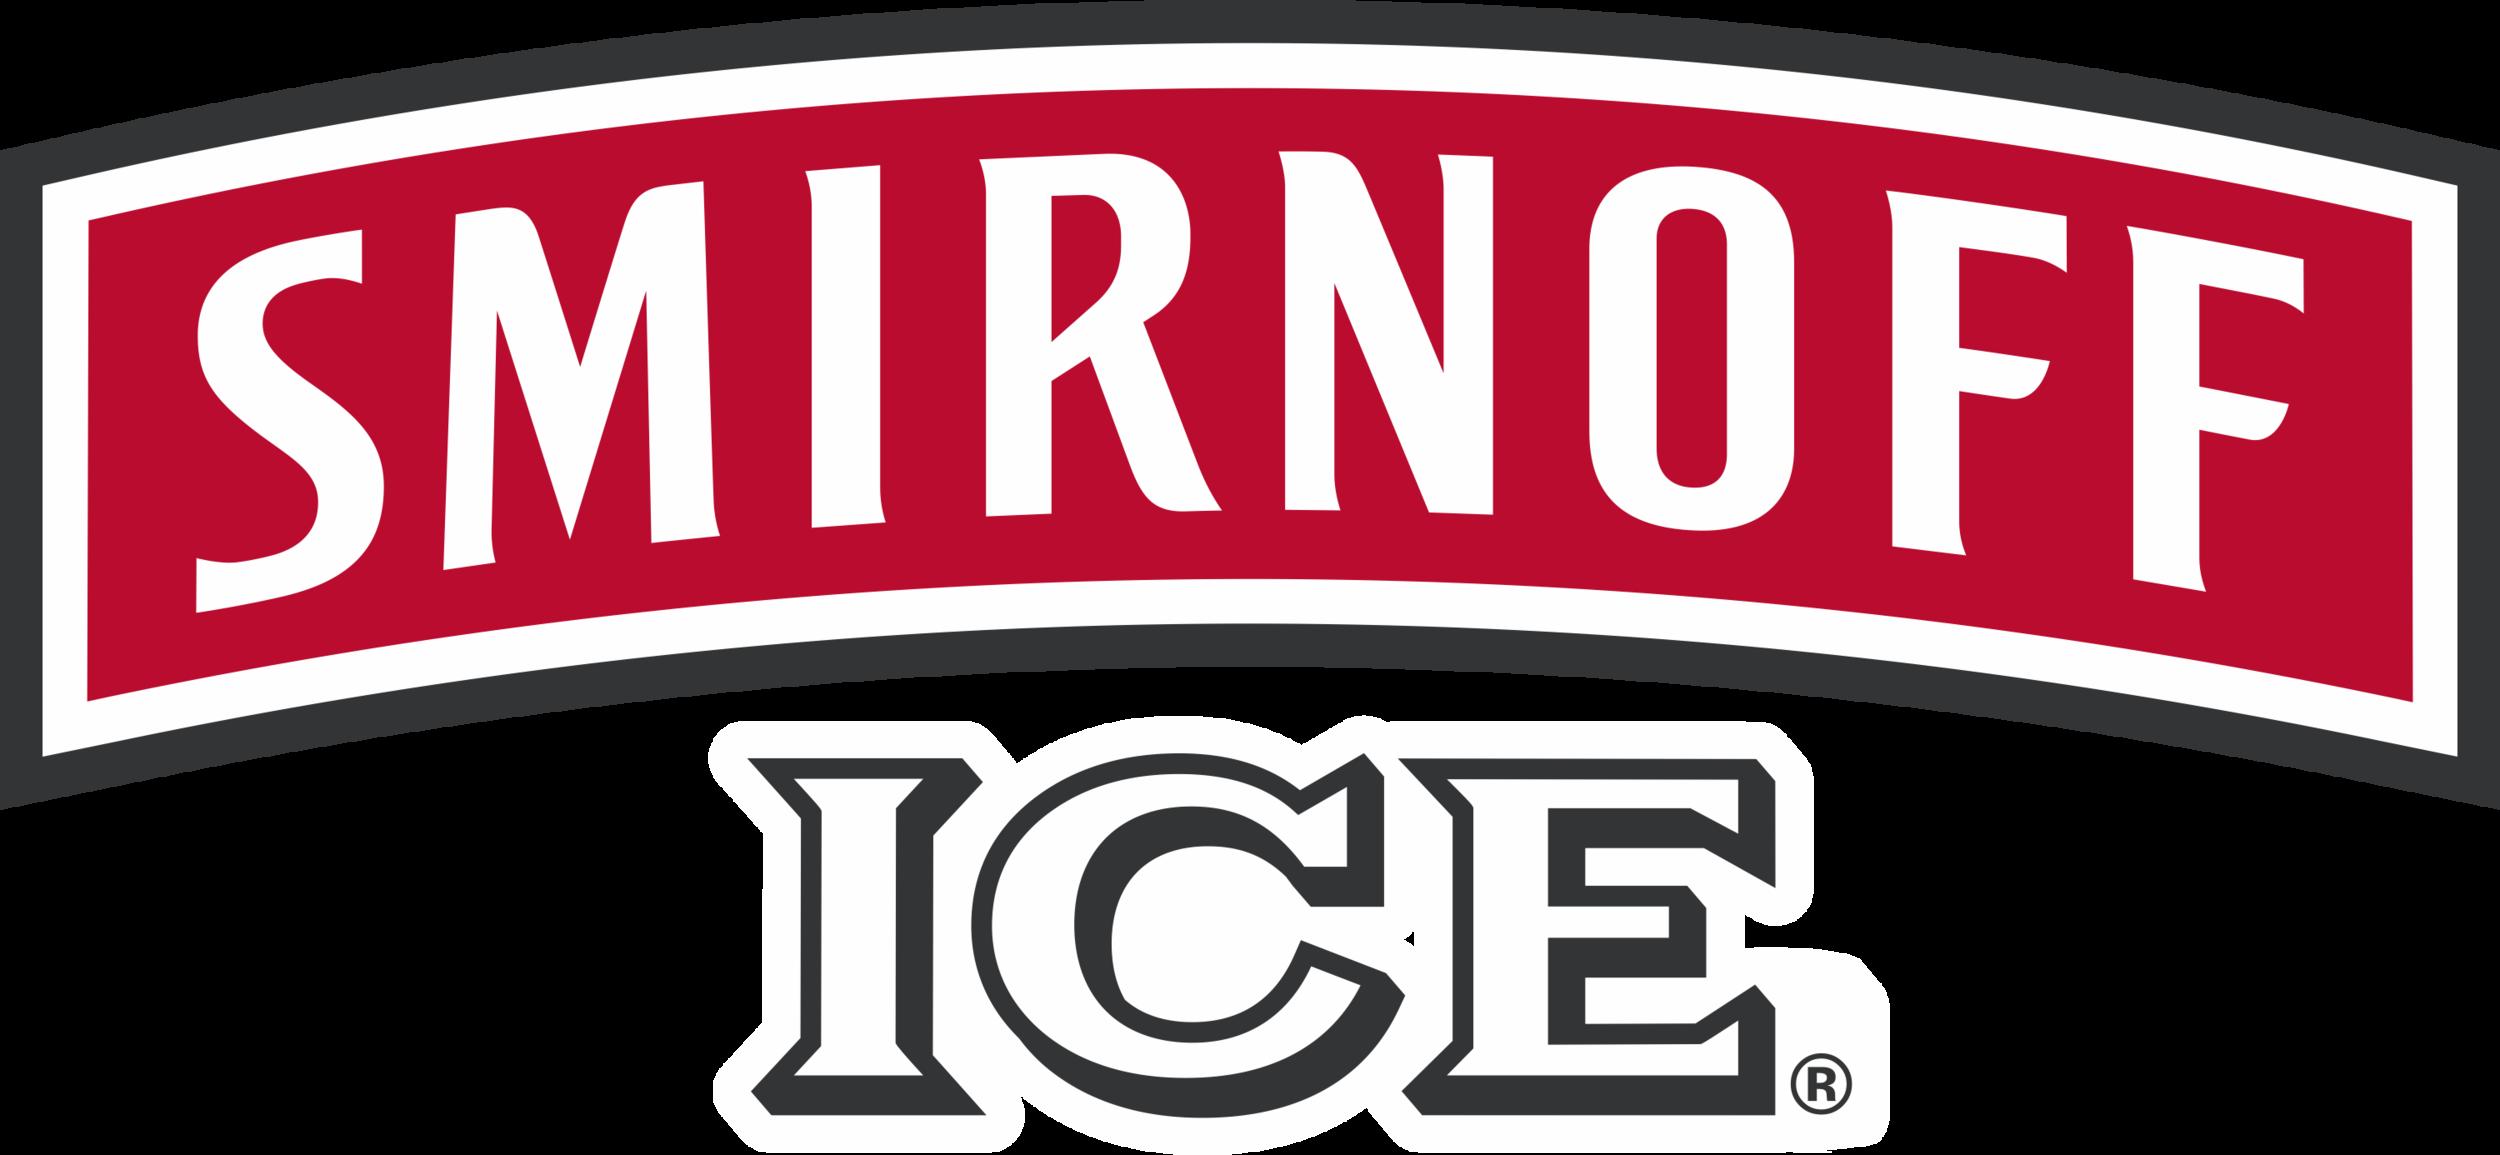 Smirnoff Logos.